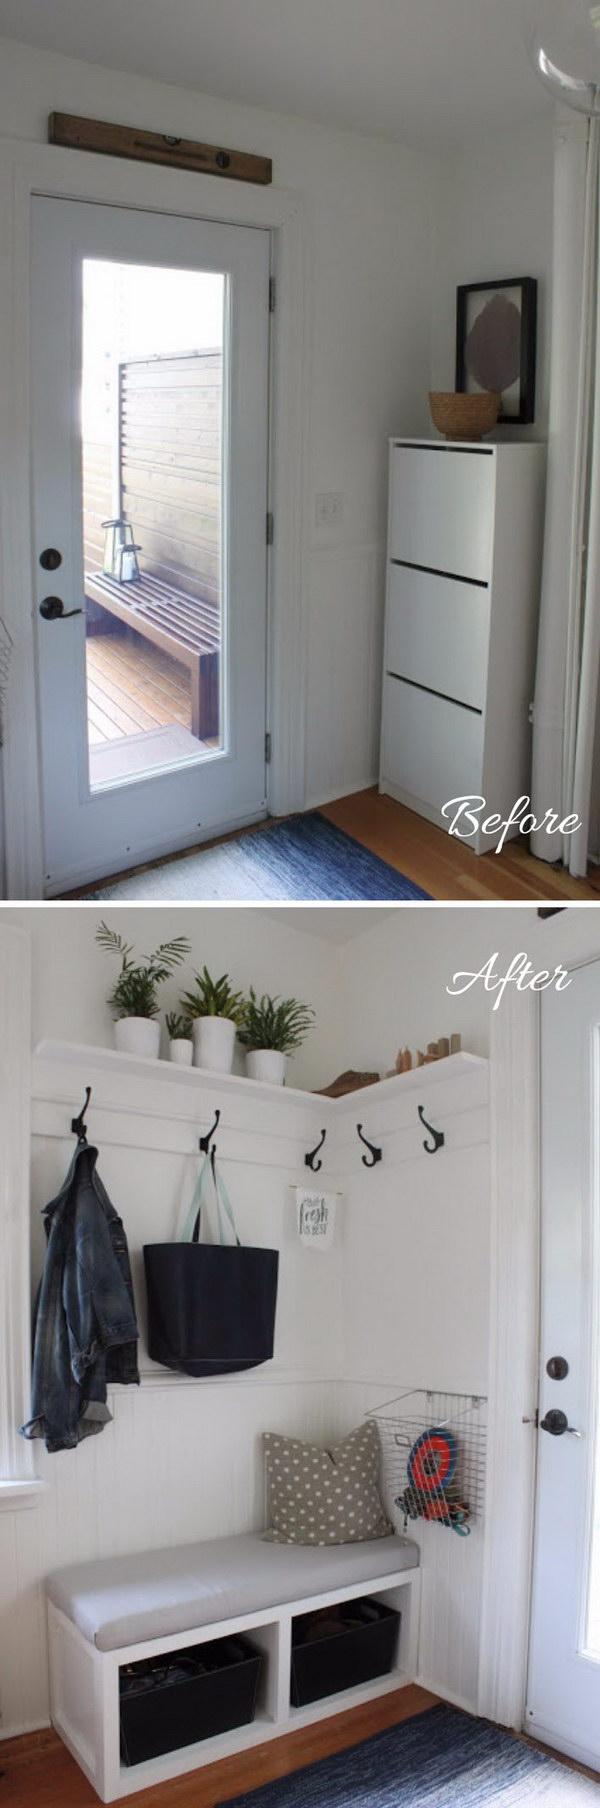 31 entryway makeover diy ideas tutorials - 30+ DIY Ideas to Give a Makeover to a Your Entryway